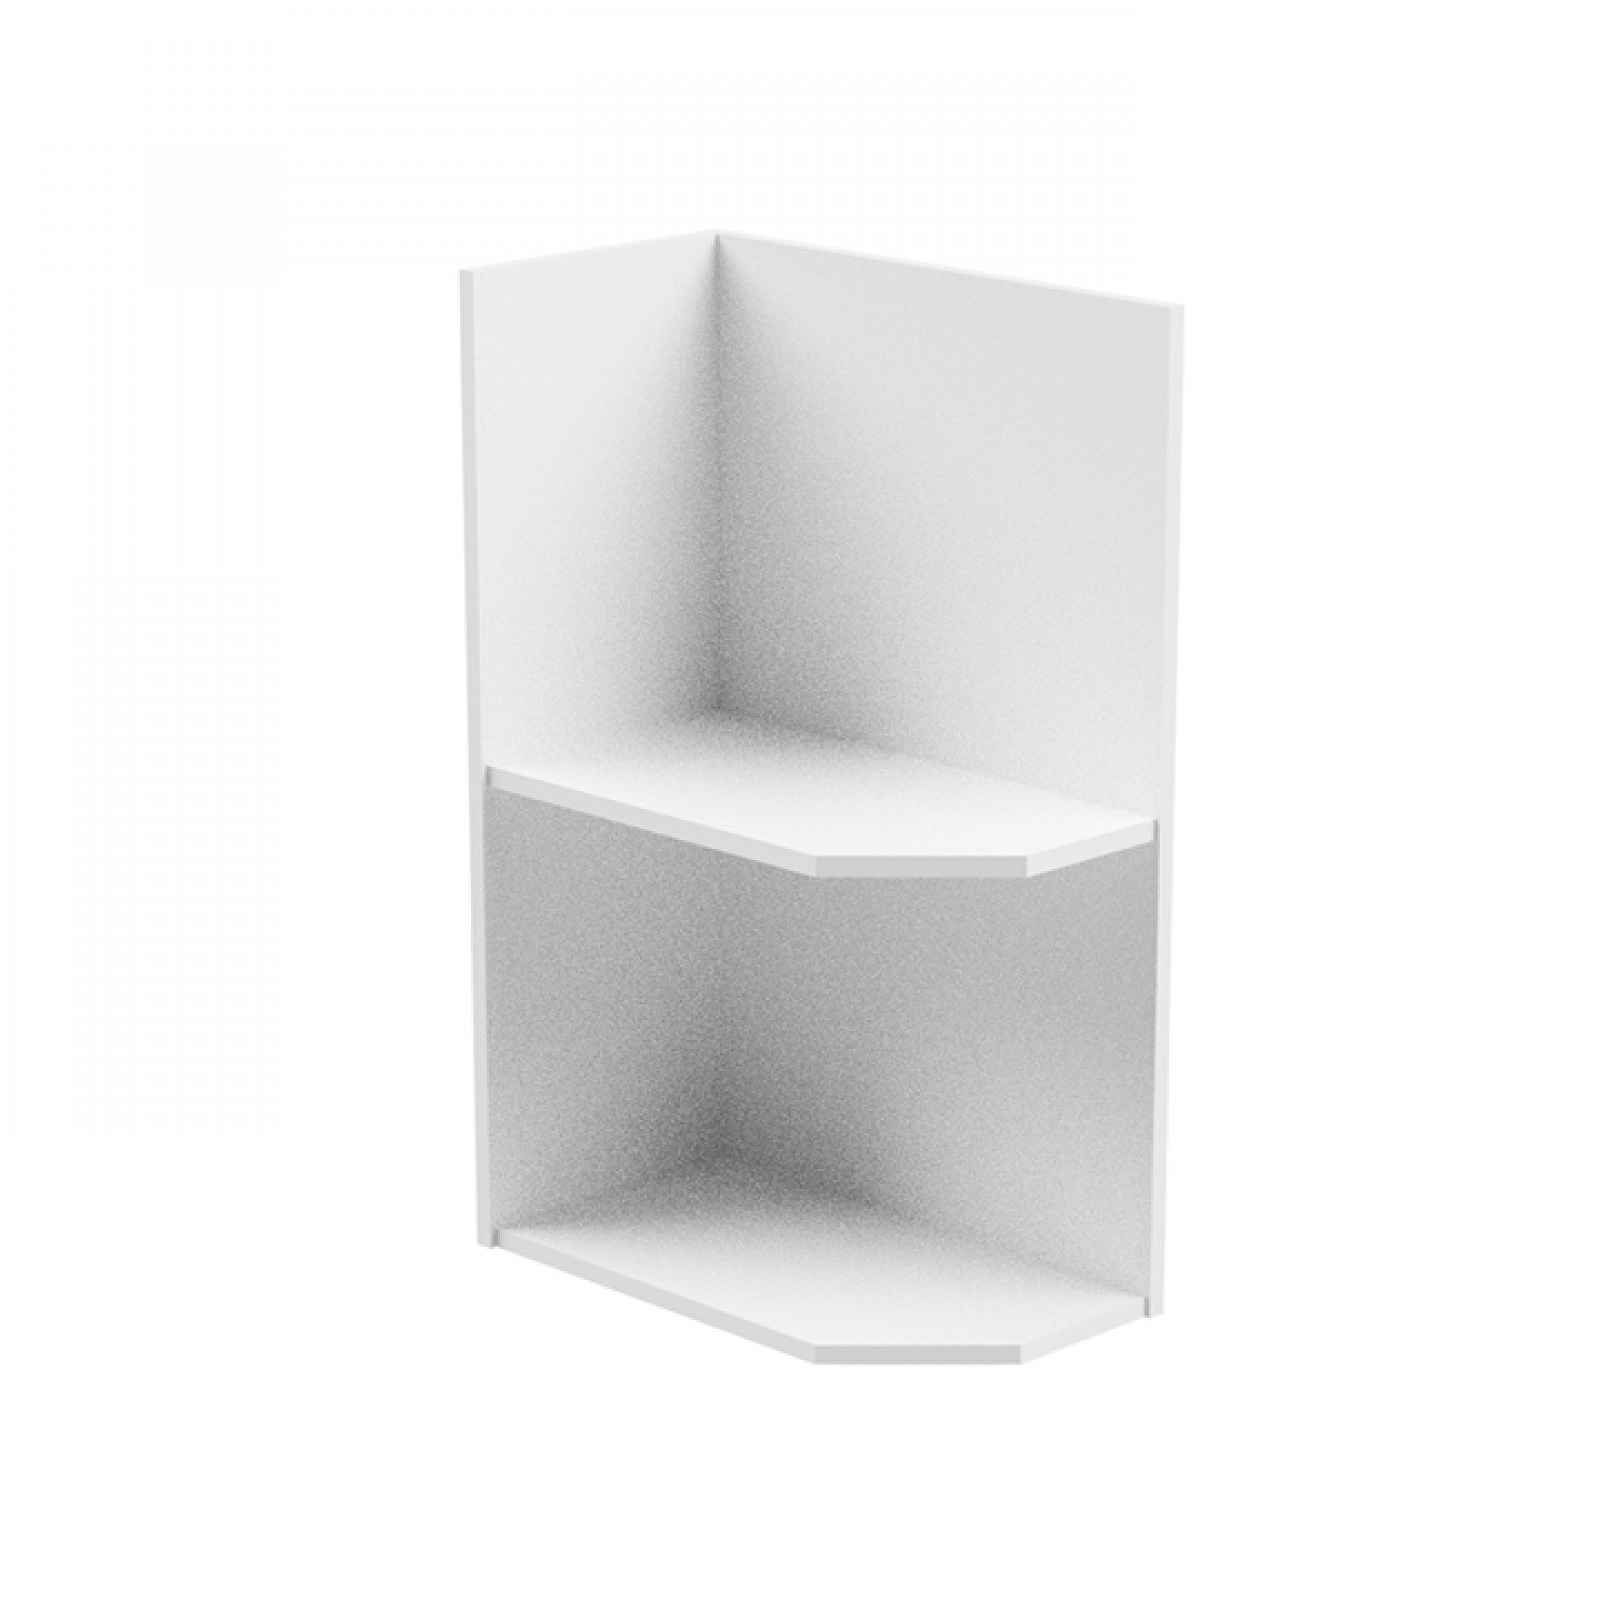 Spodní skříňka, bílá, levá, AURORA D25PZ 0000236726 Tempo Kondela